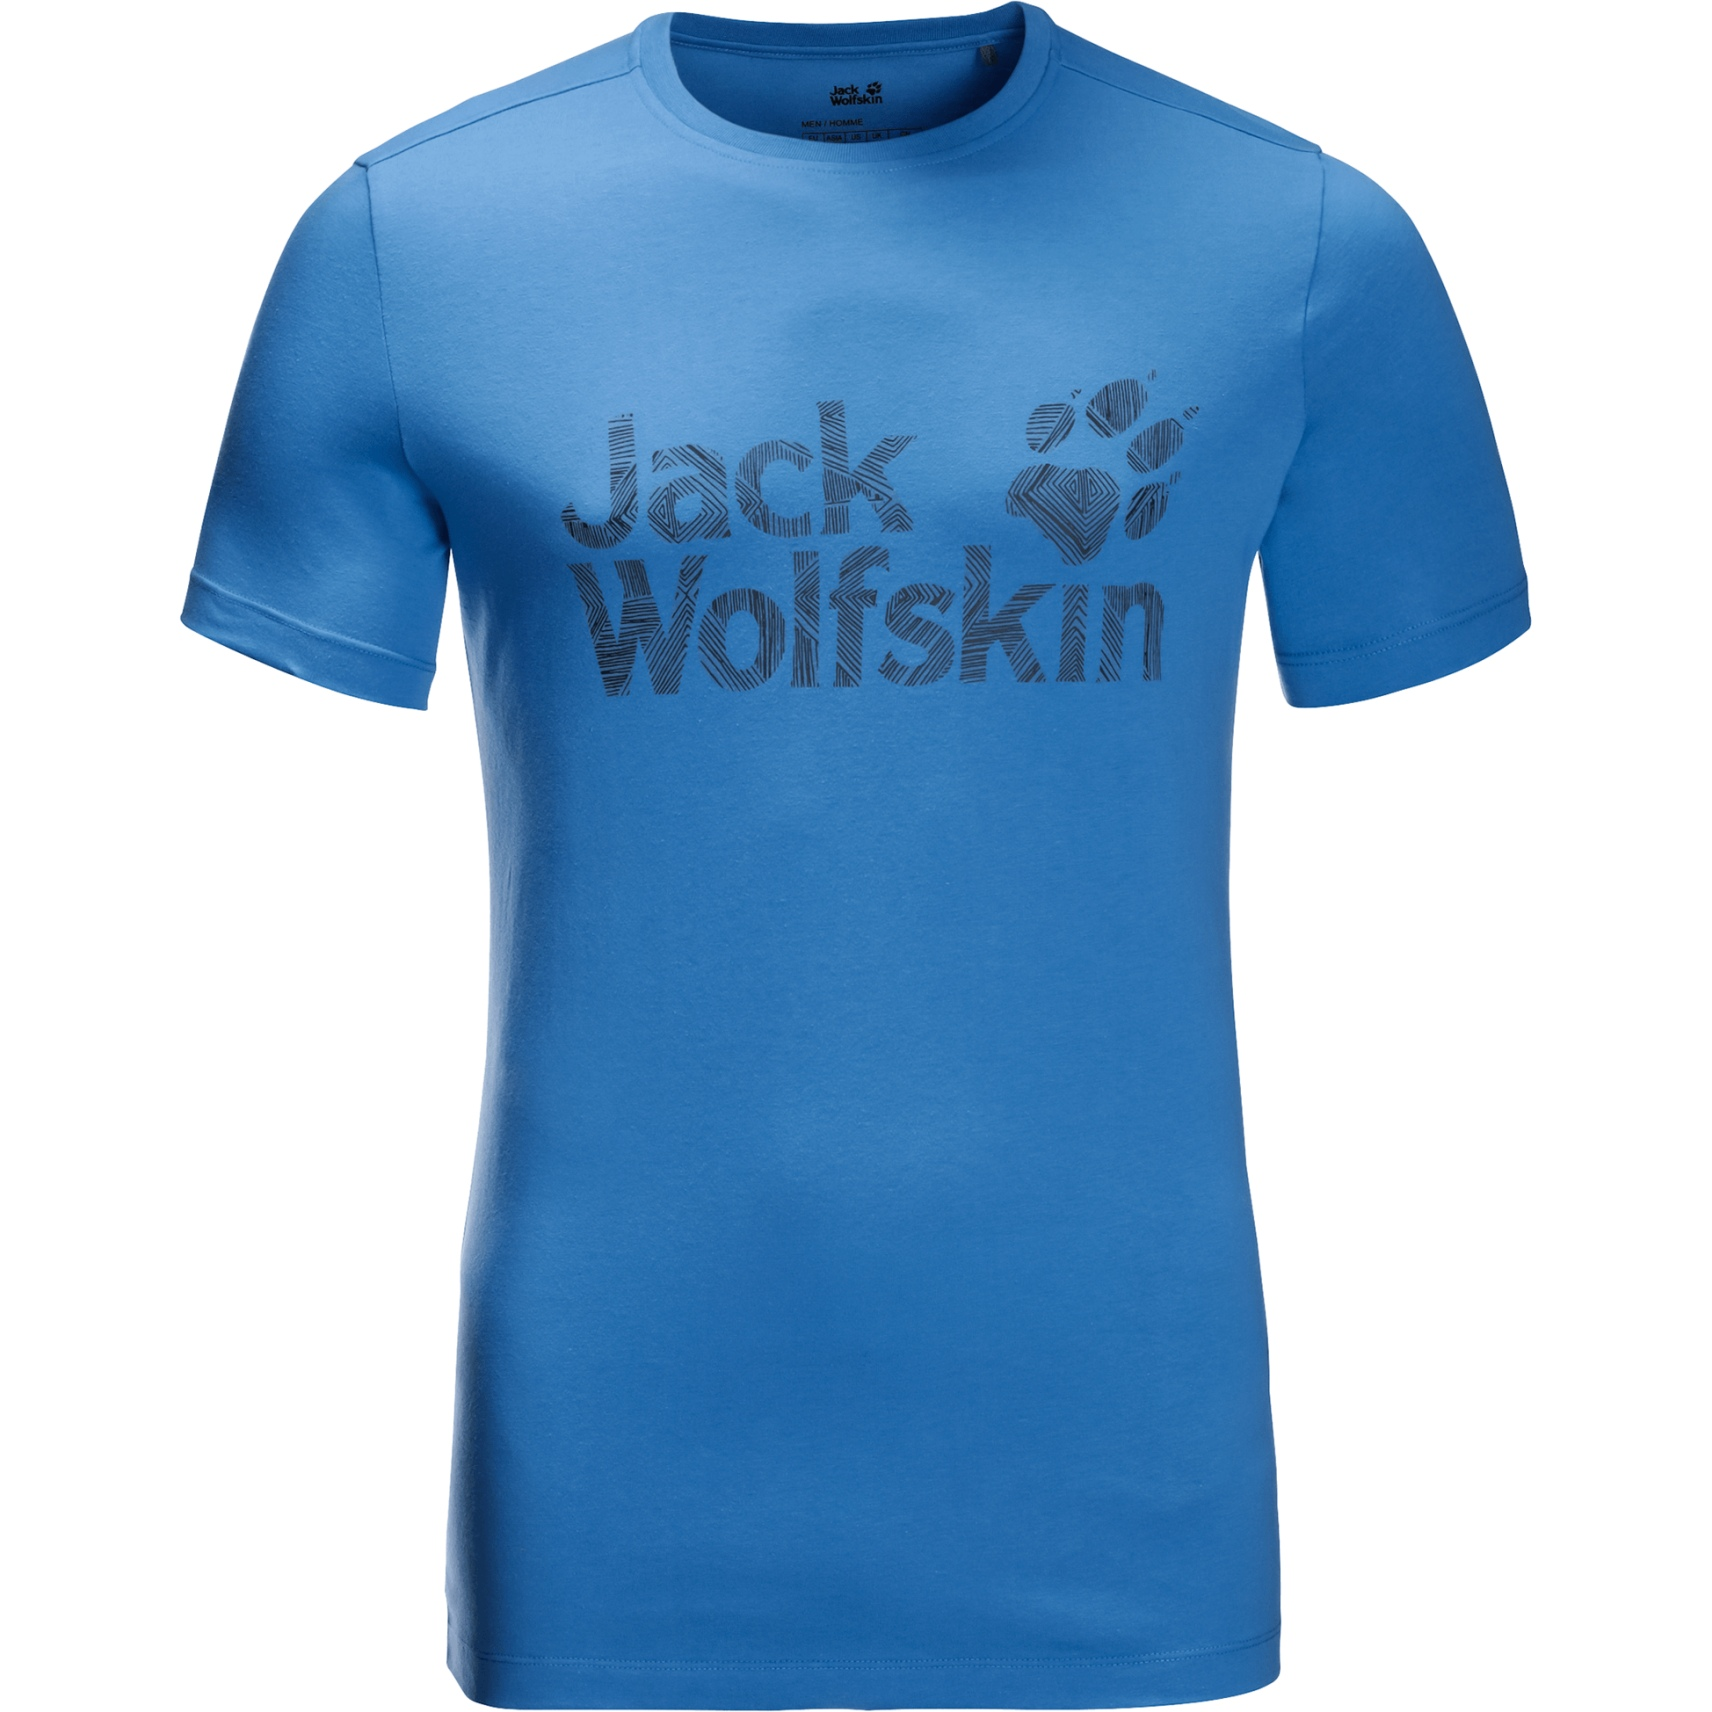 Jack Wolfskin Brand Logo T-Shirt - wave blue